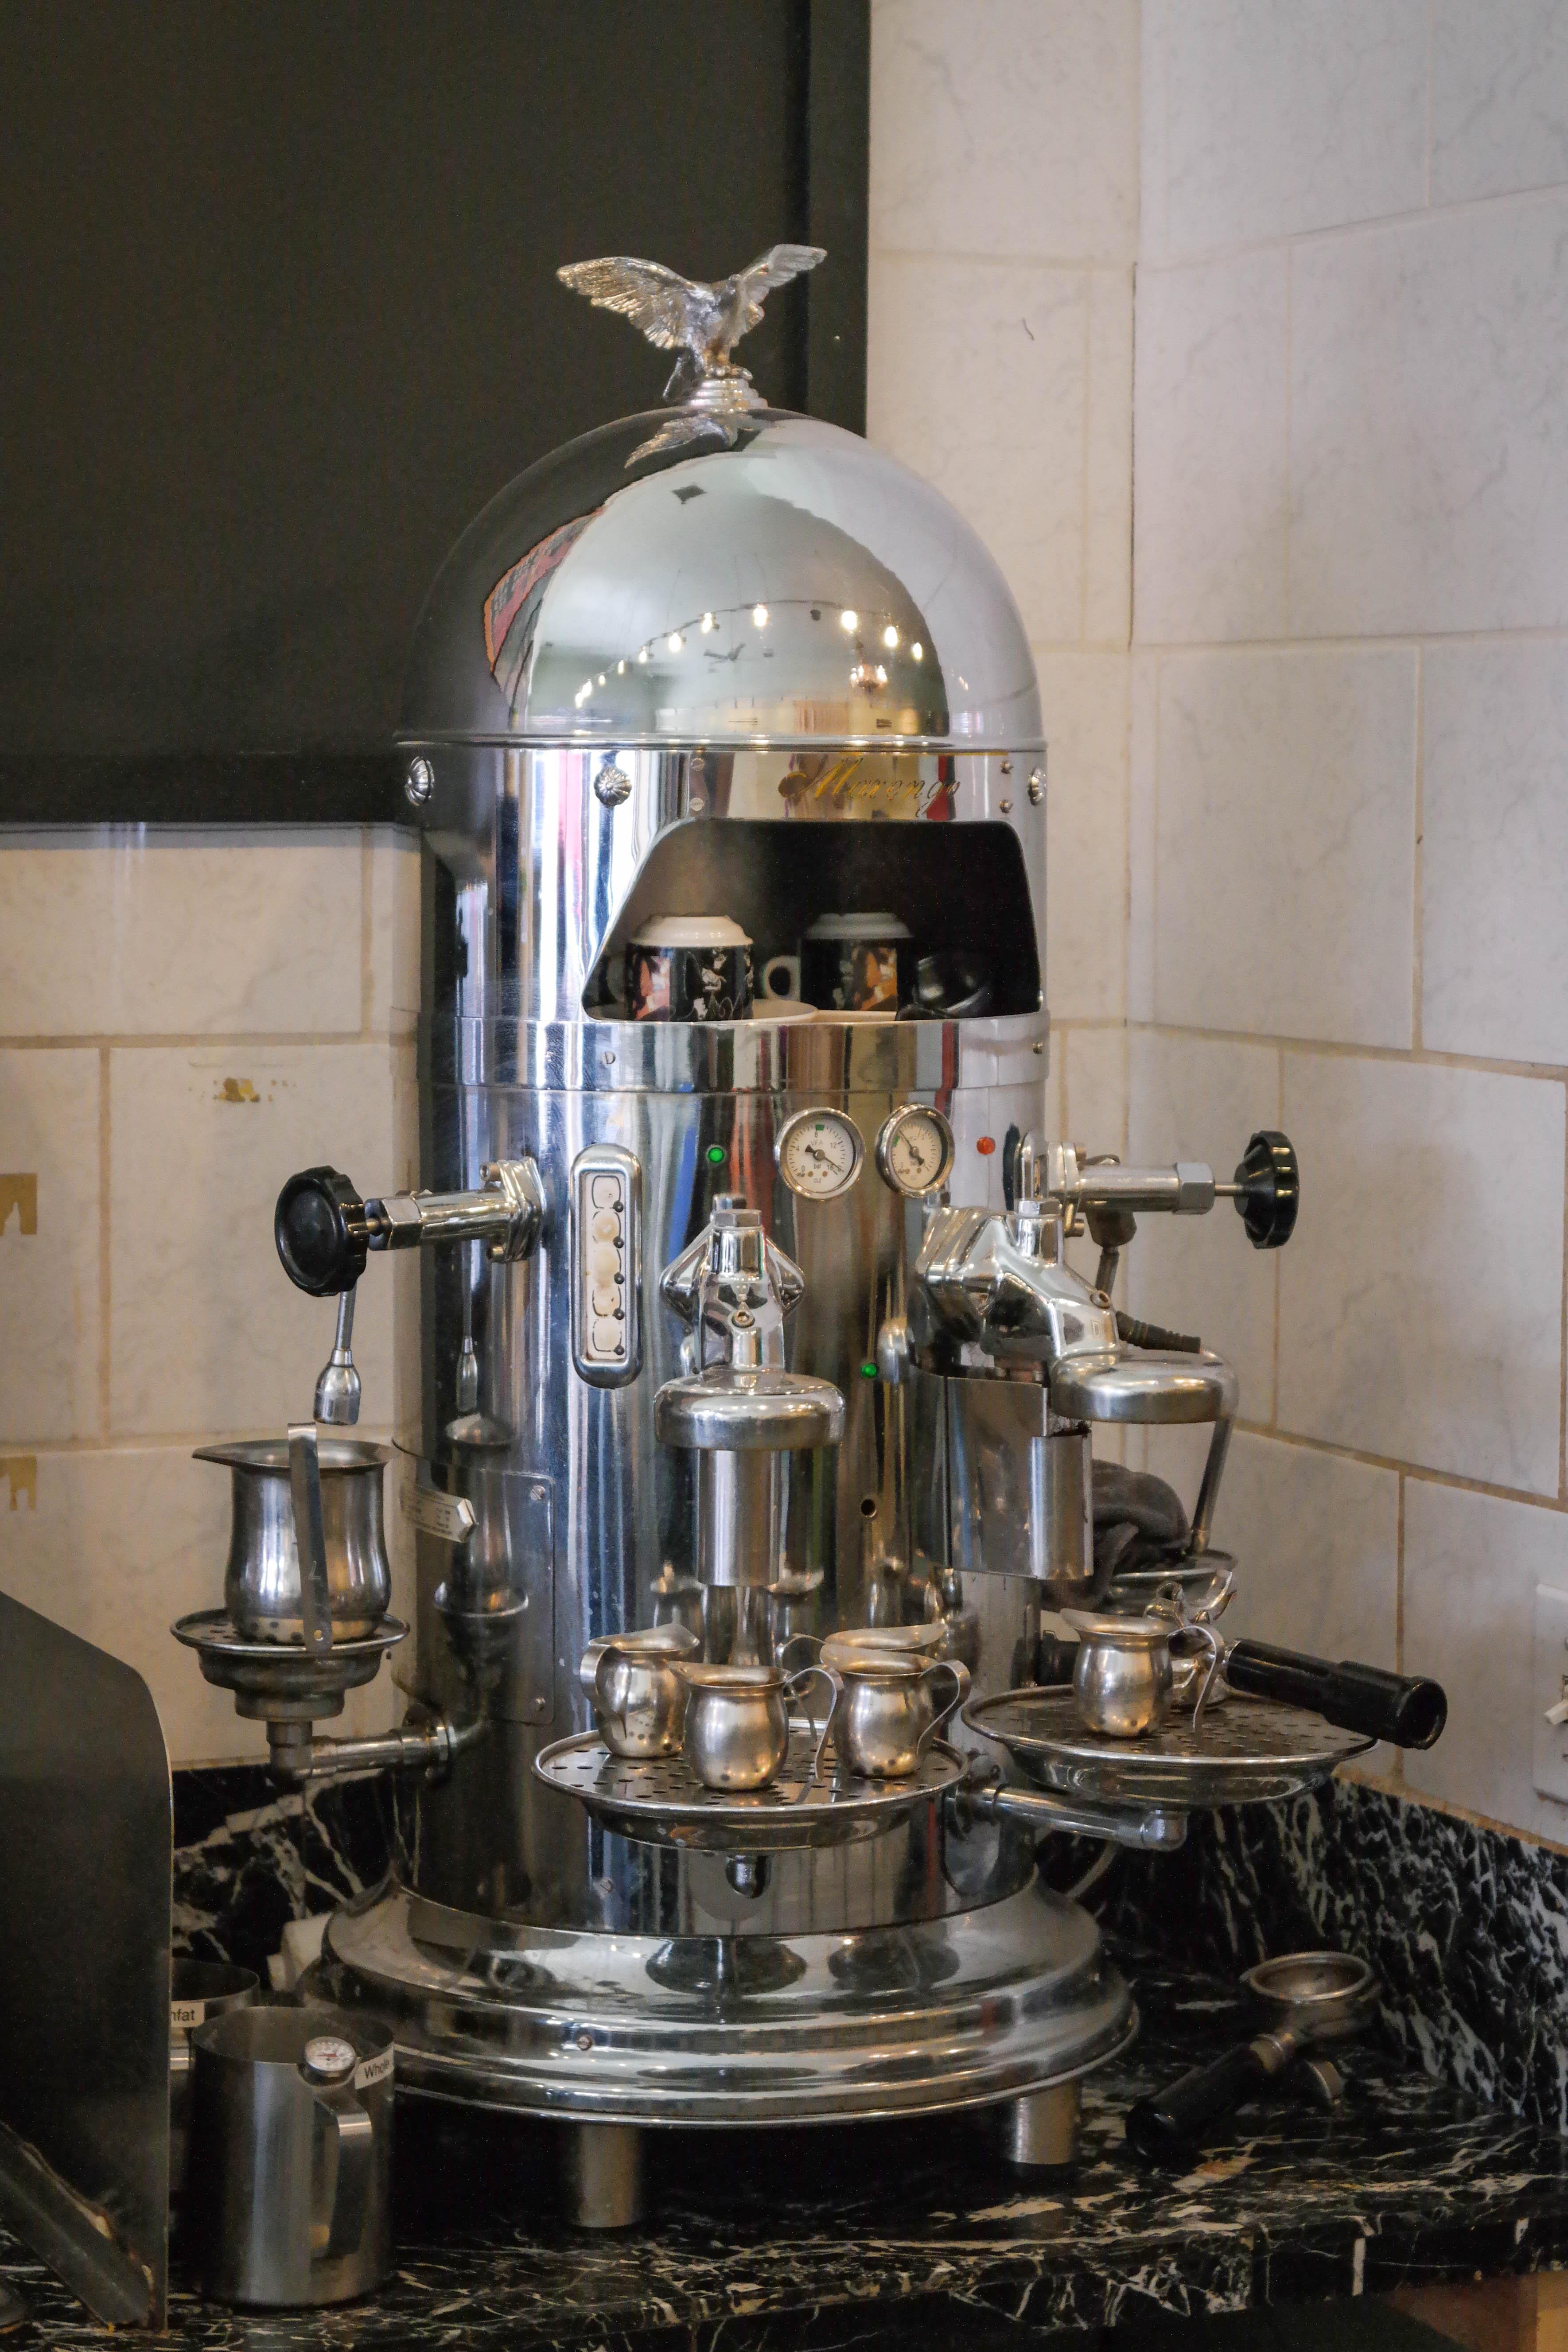 file marengo espresso machine cafe de l 39 wikimedia commons. Black Bedroom Furniture Sets. Home Design Ideas